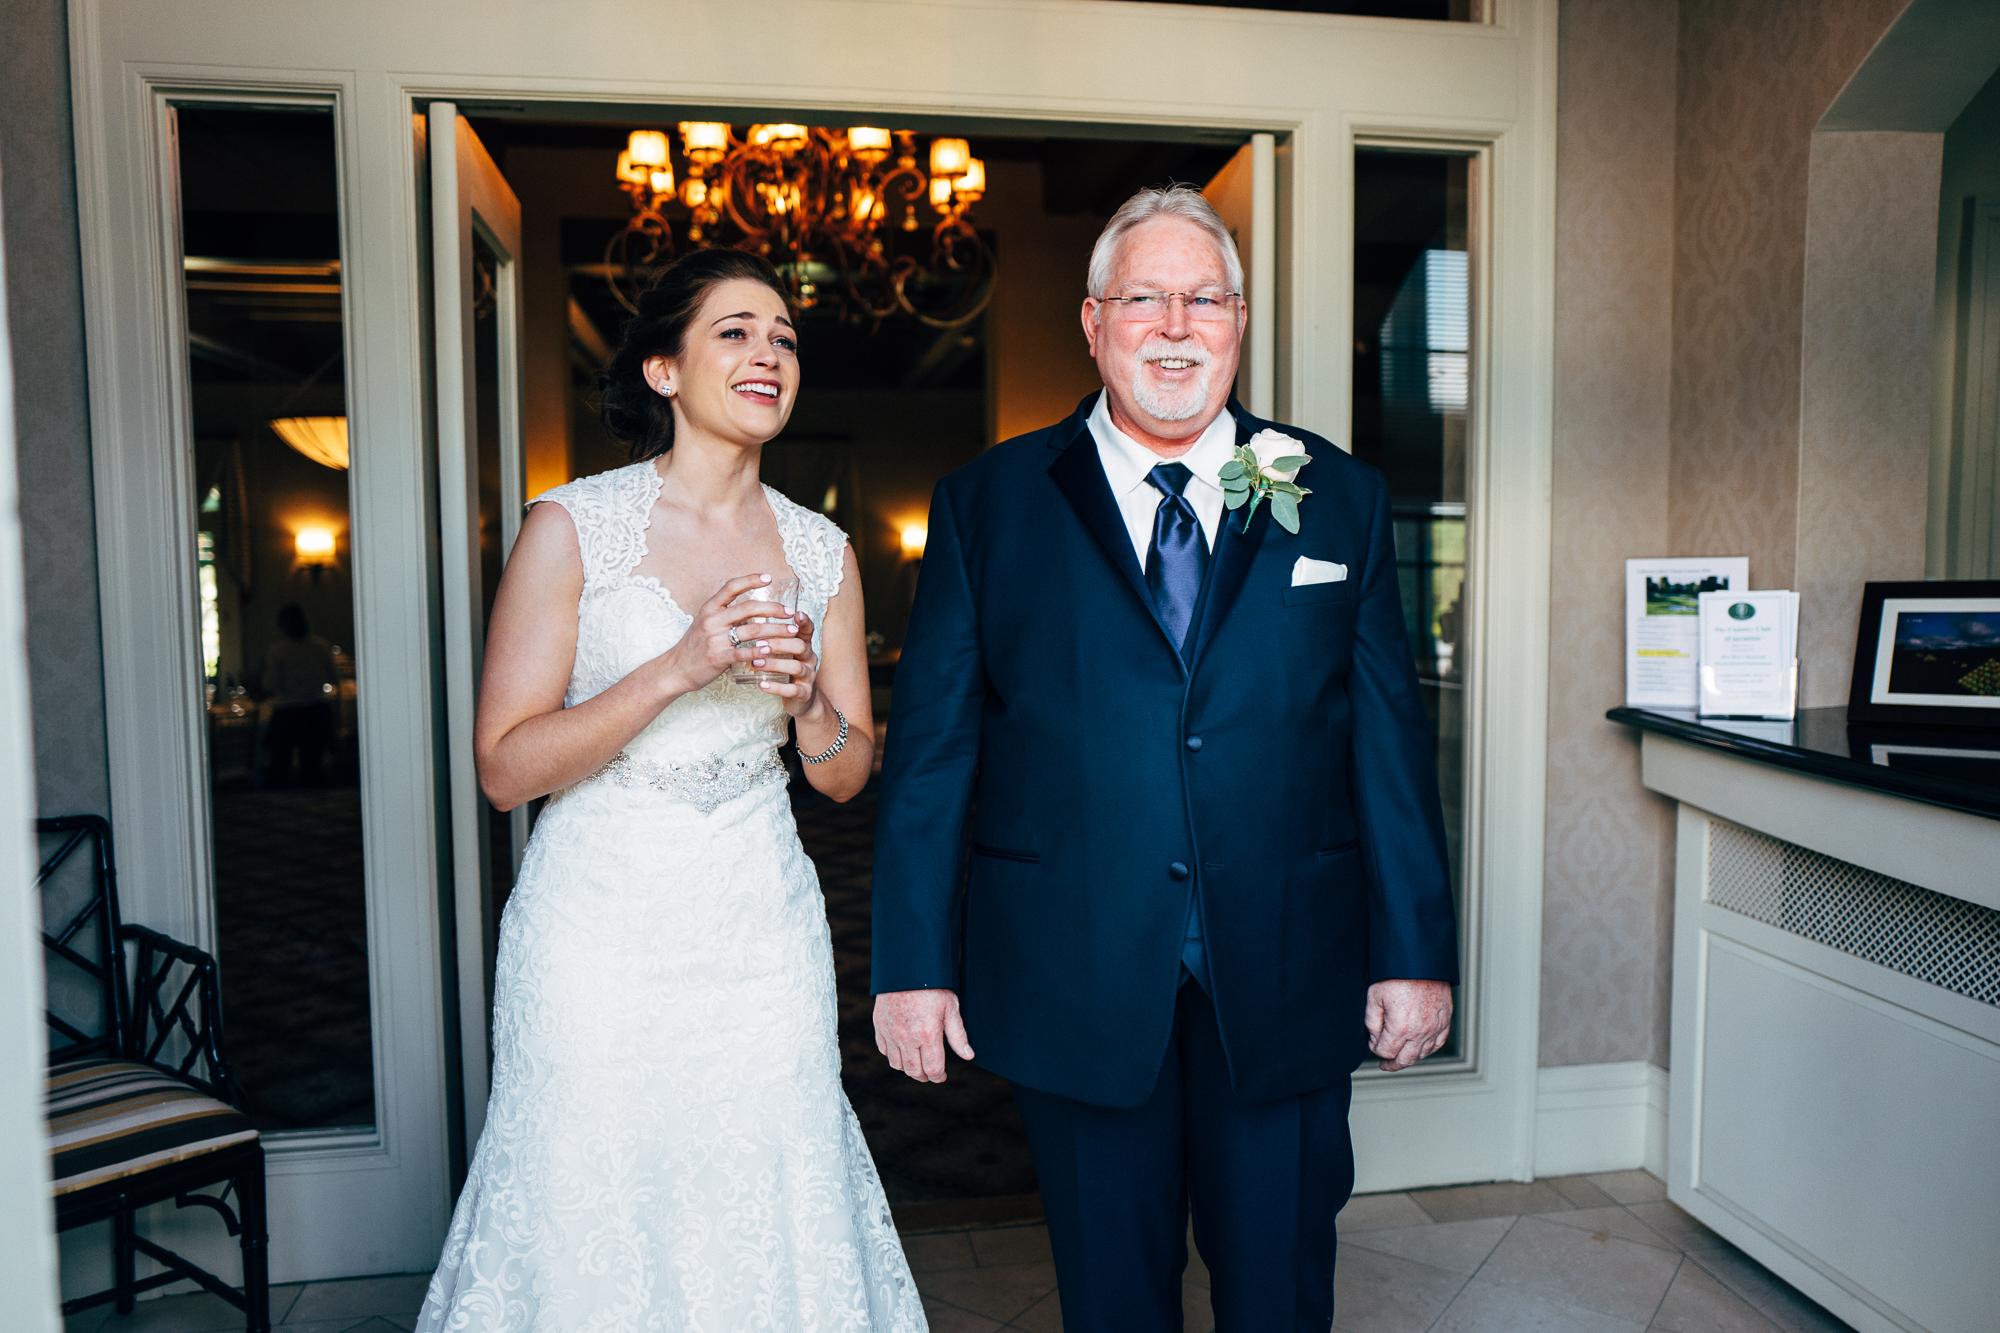 scranton-wedding-photography-zak-zavada-2016.06-rebeccaIan-0388.jpg